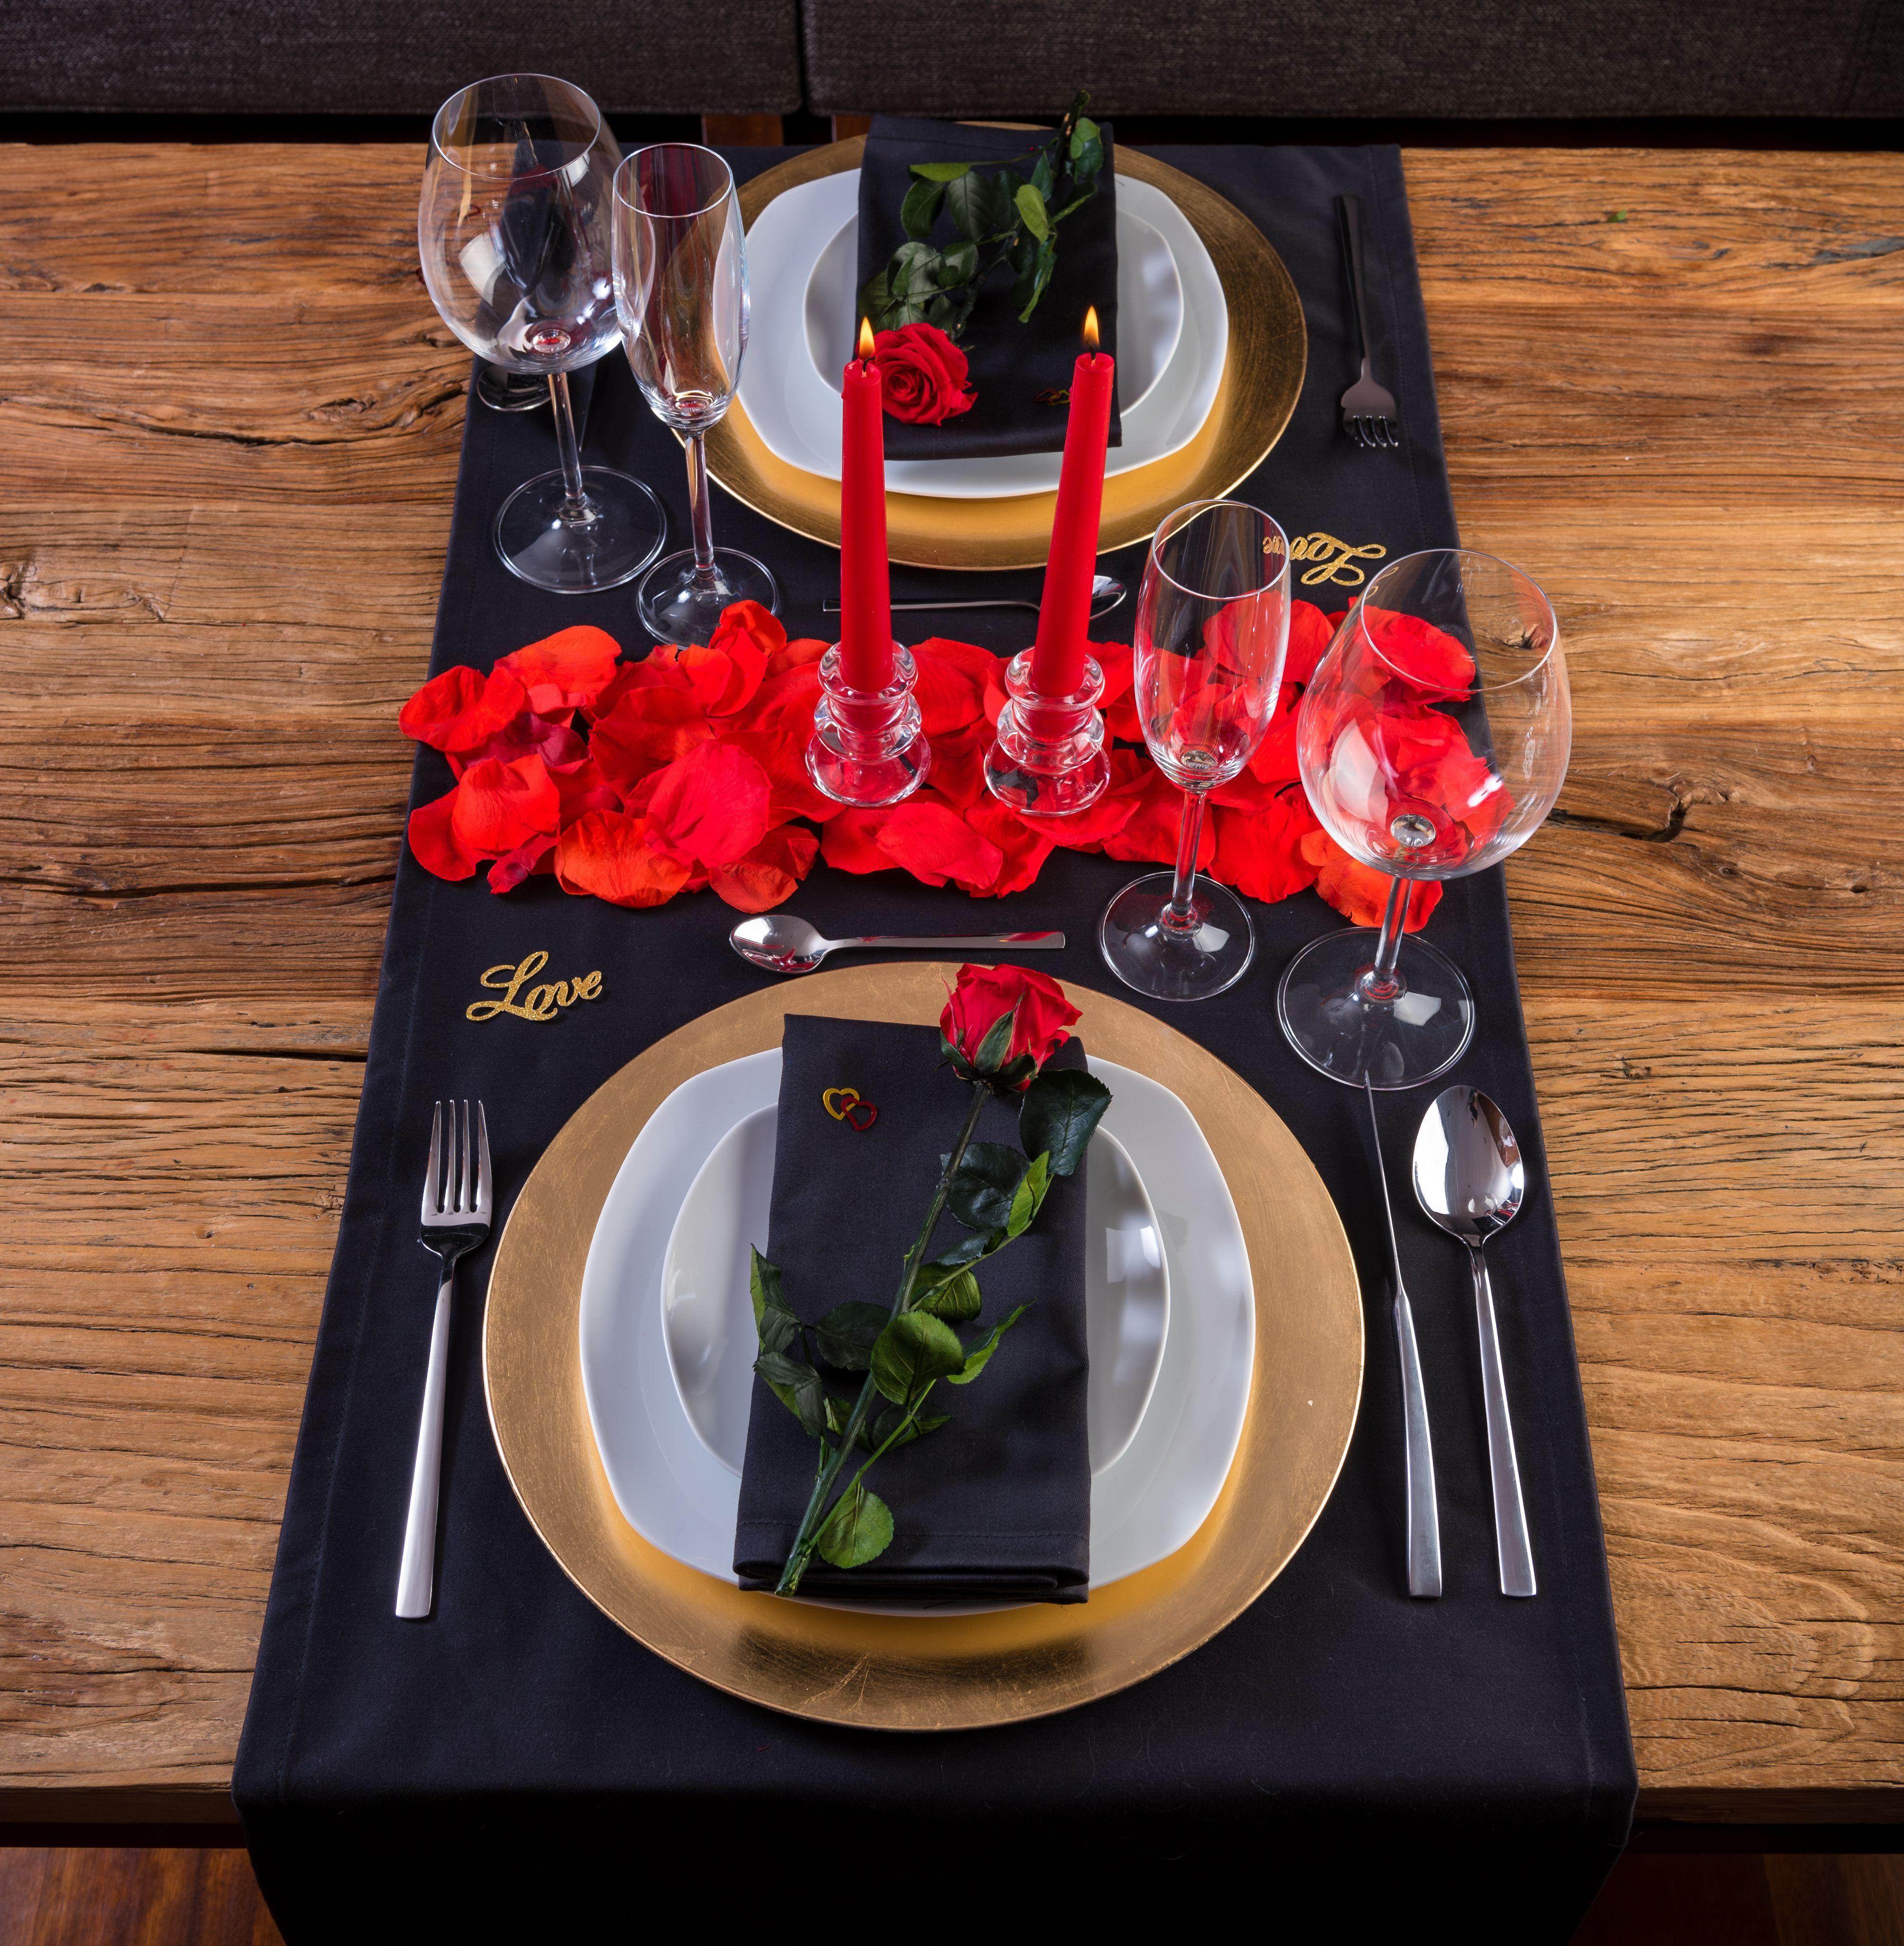 Noche rom ntica 79 ideas para sorprender cena for Cena romantica para mi novio